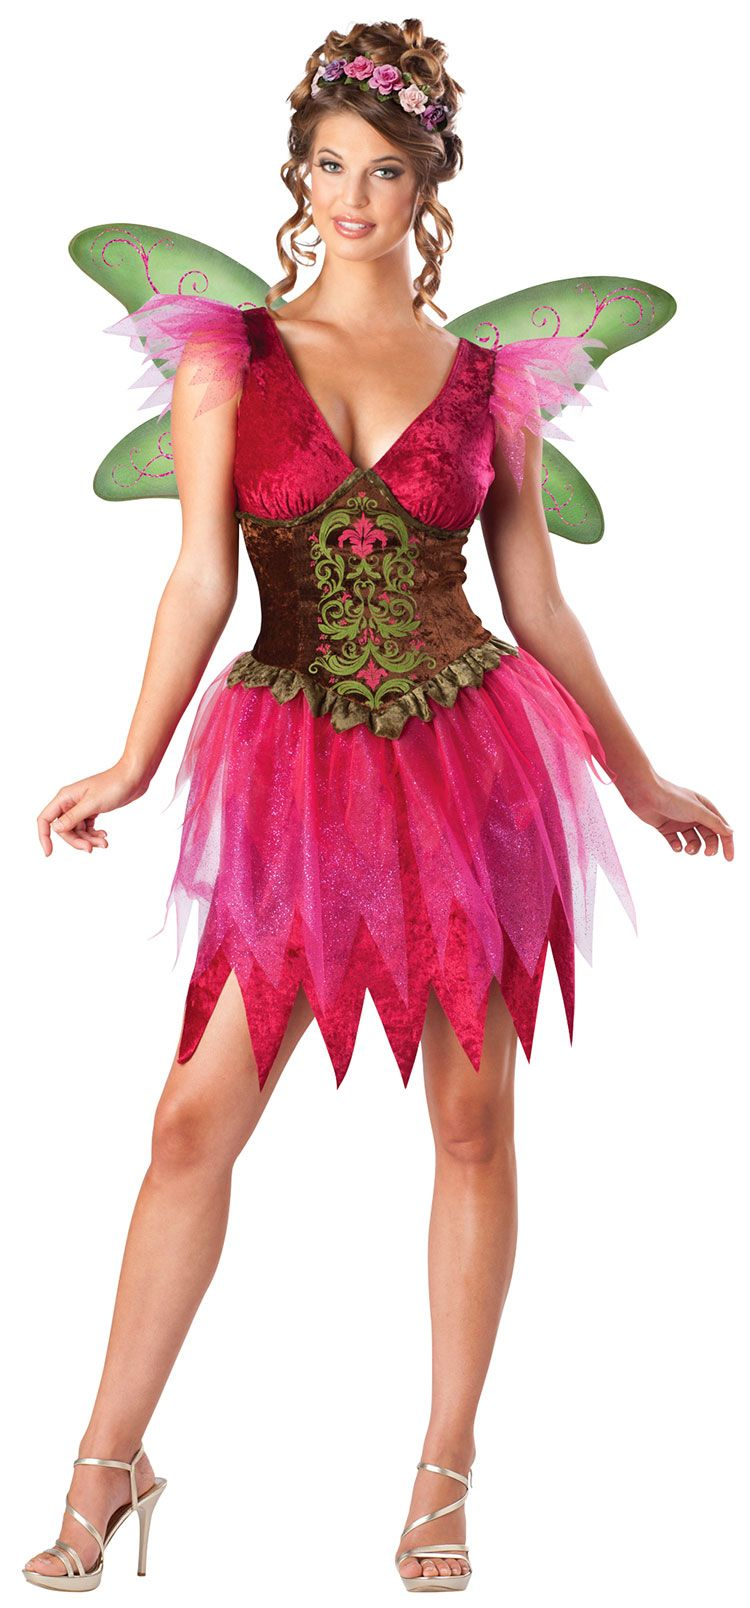 Forest Fairy Queen Costume Halloween Fancy Dress